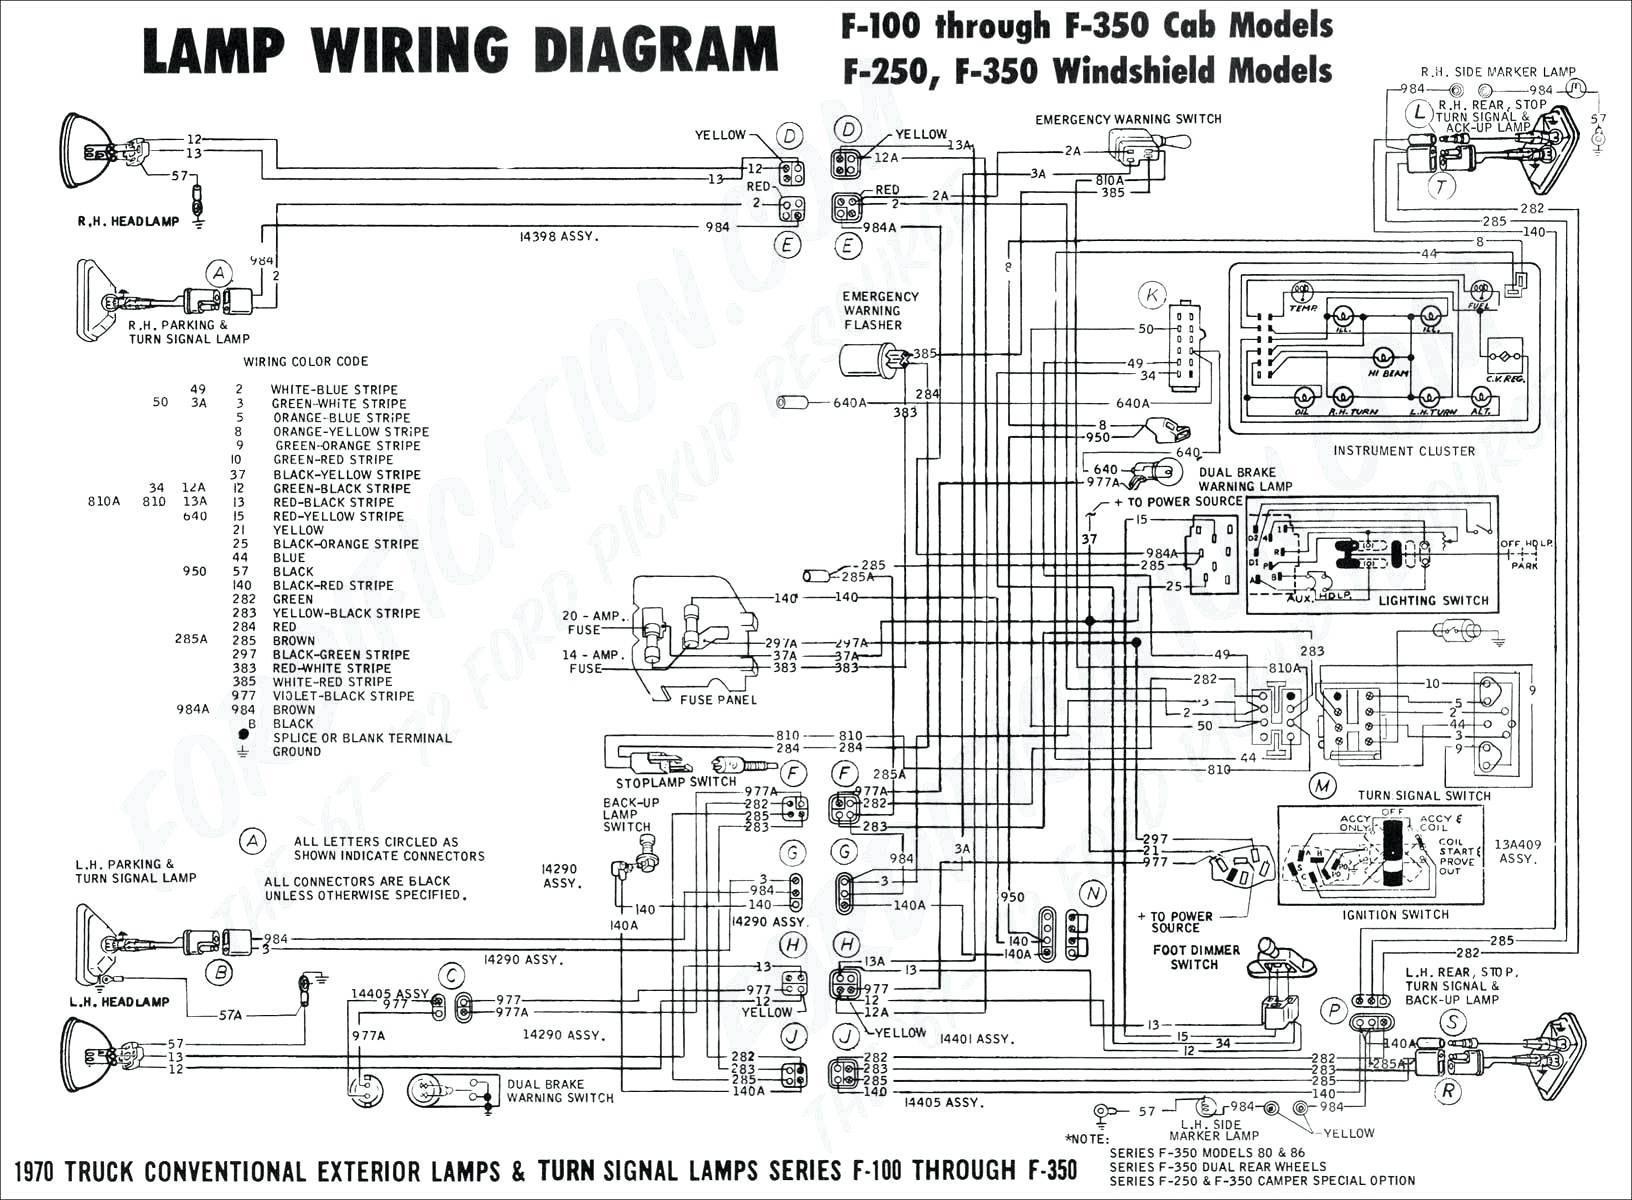 Gas Engine Parts Diagram ford 5 4 Engine Wiring Layout Wiring Diagrams • Of Gas Engine Parts Diagram